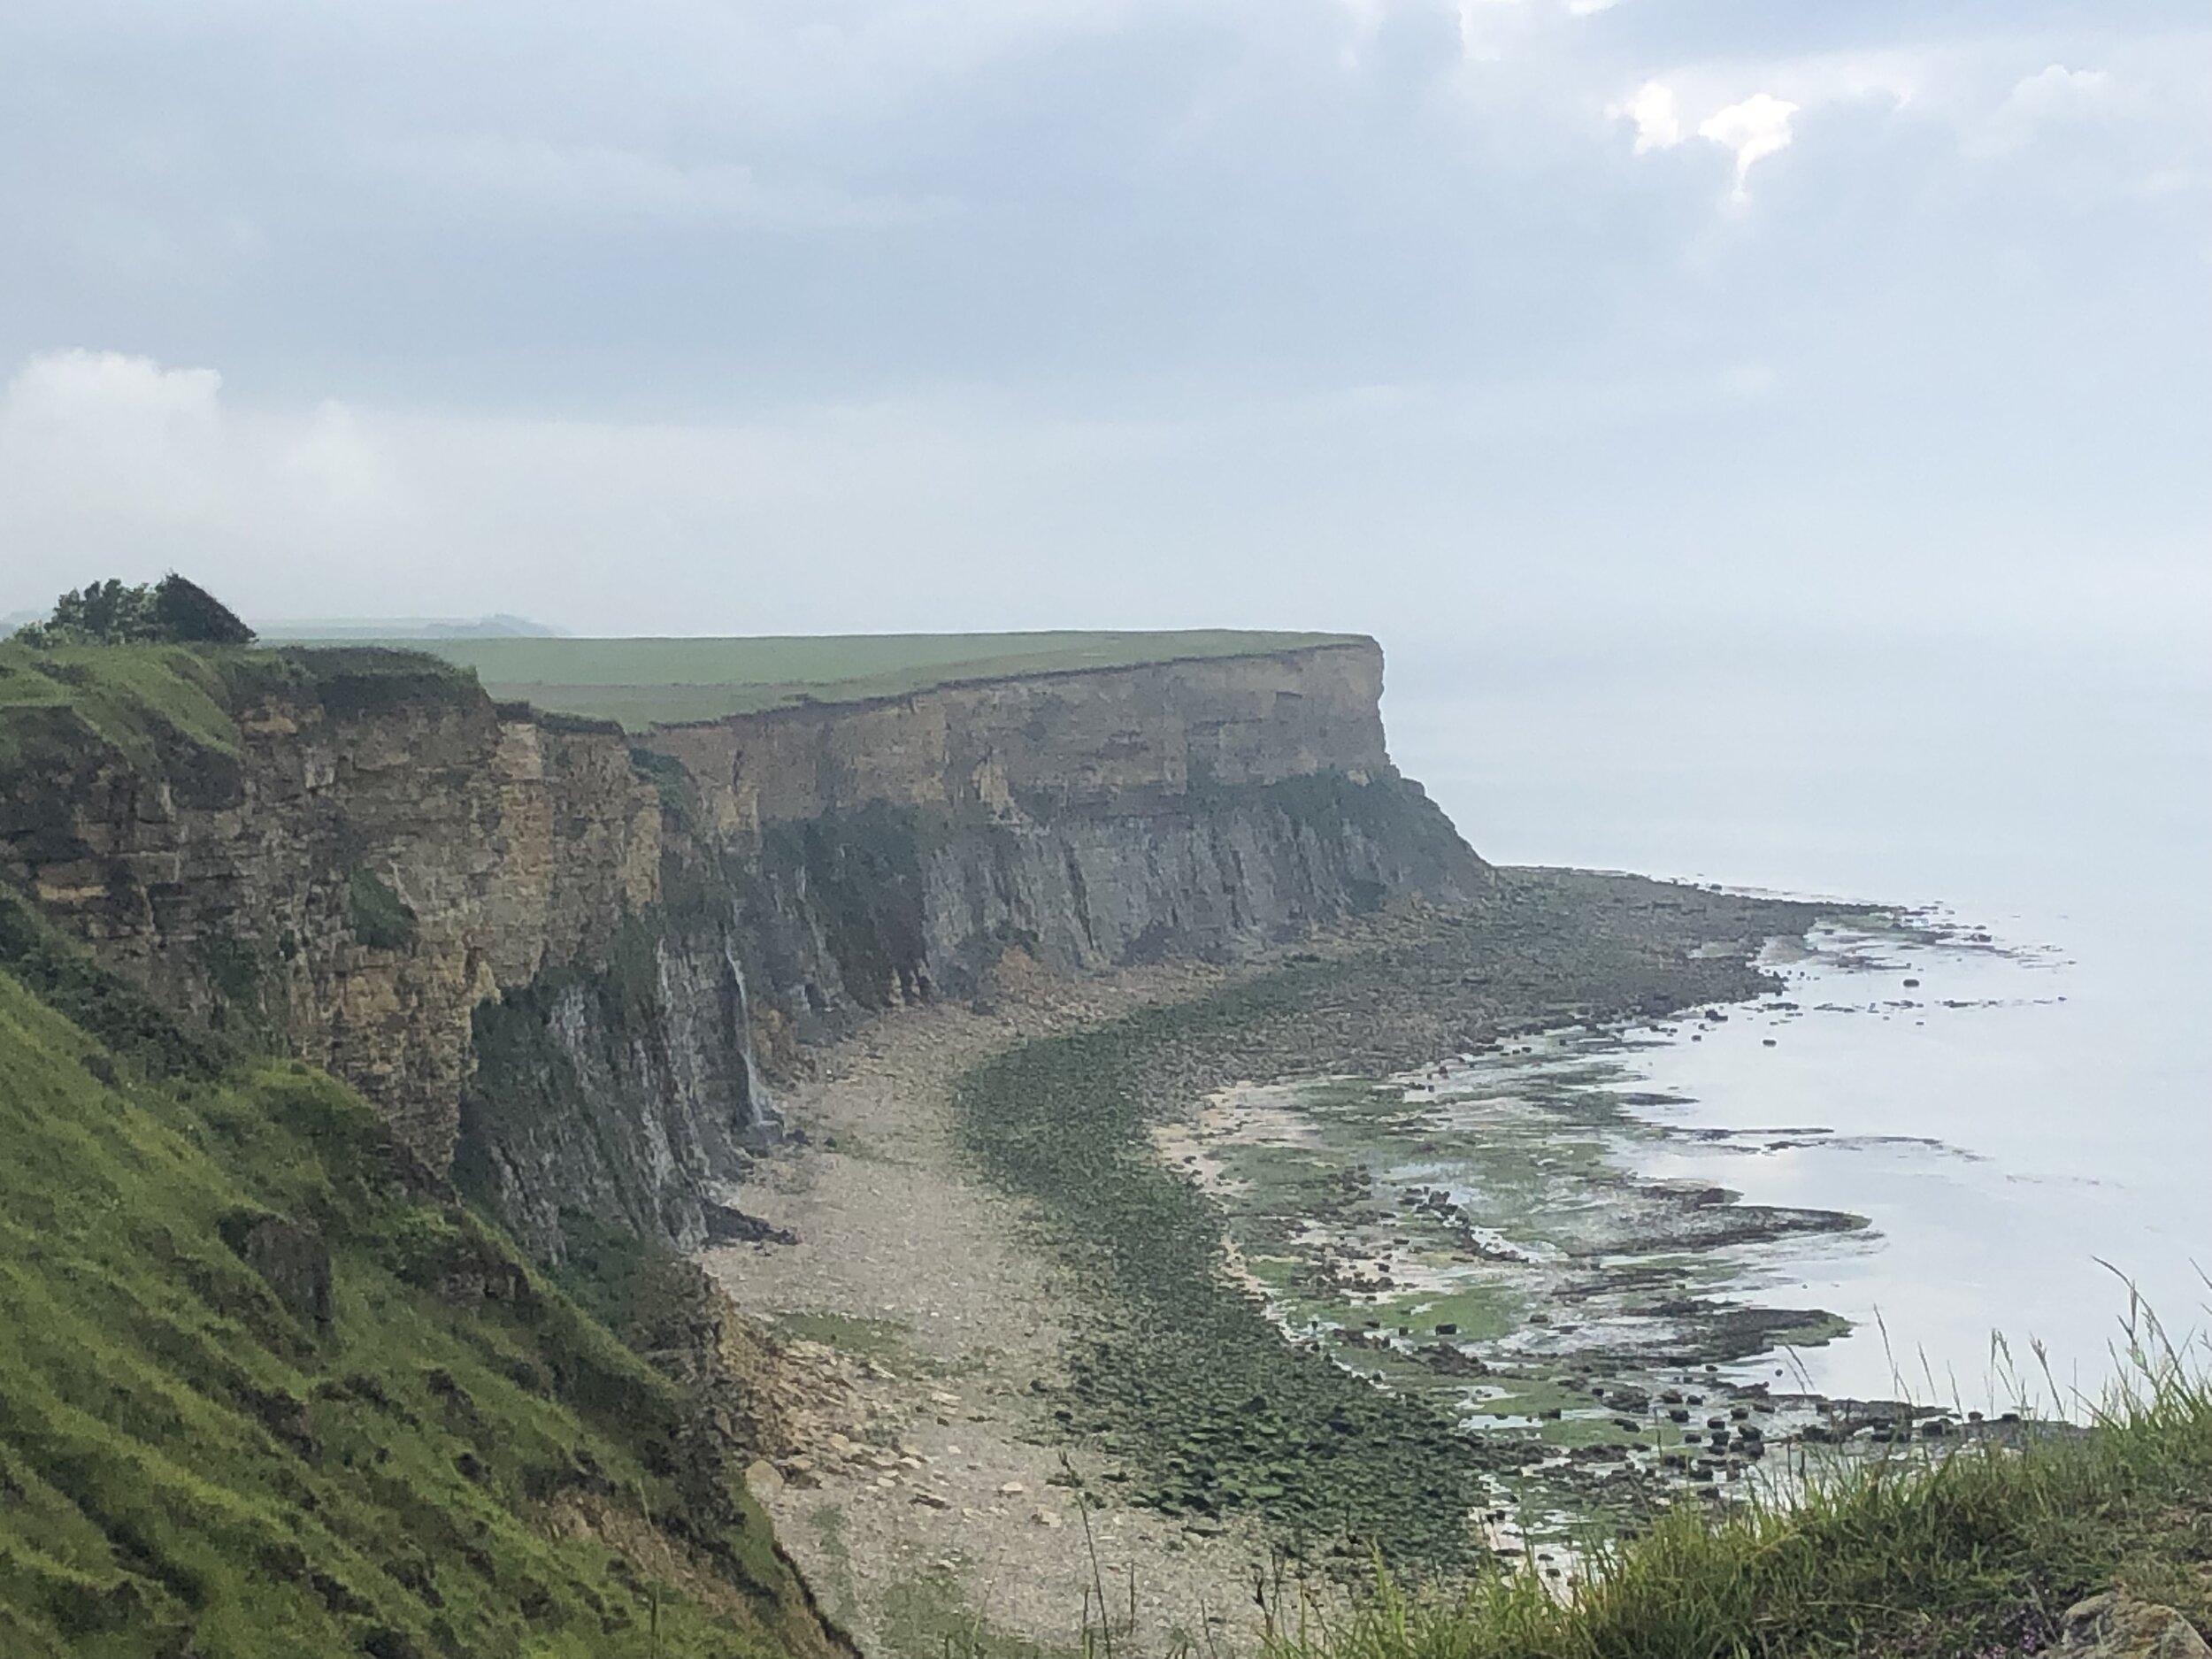 The Cliffs by Gold Beach